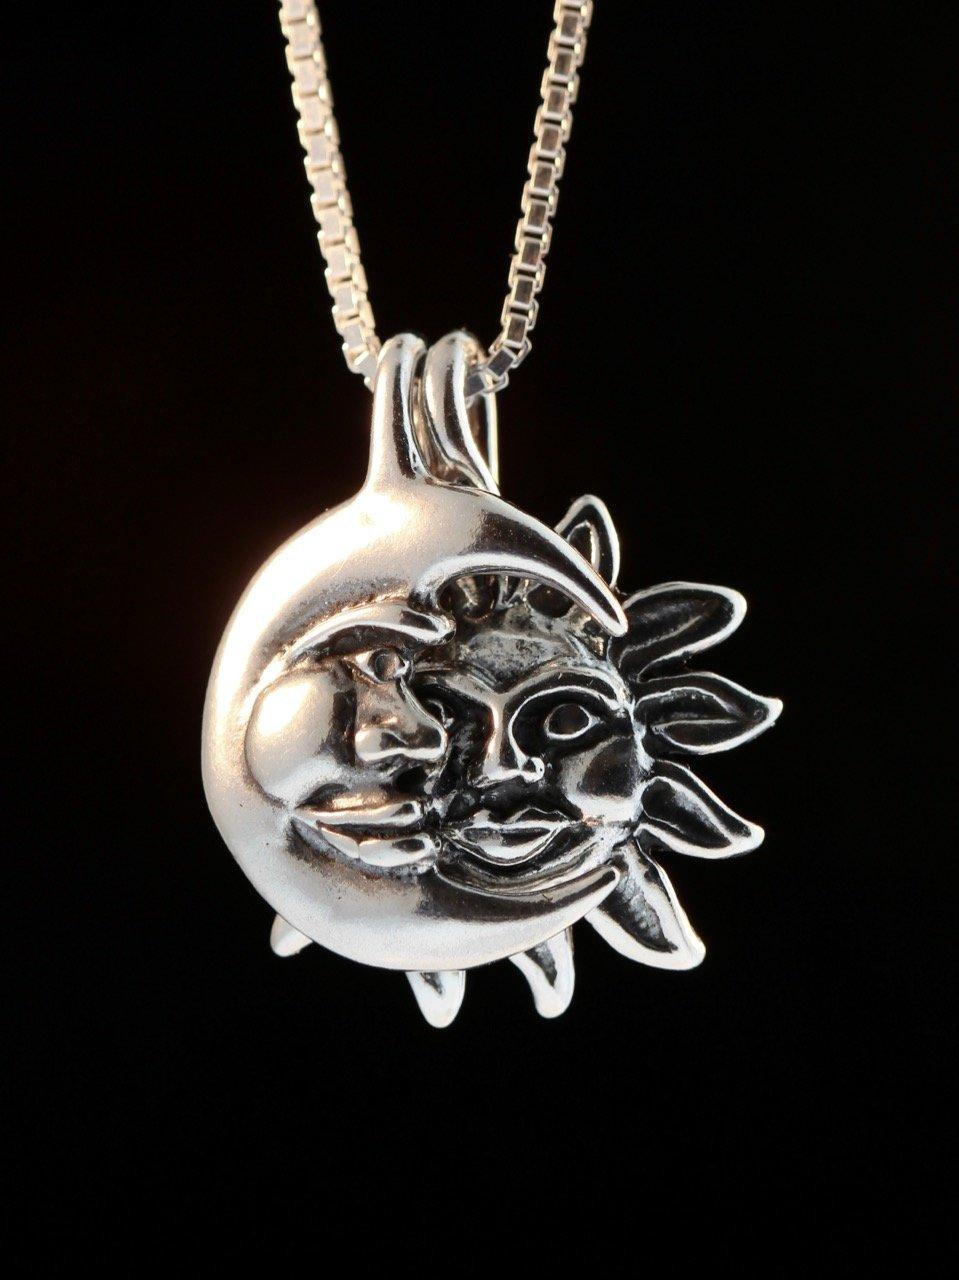 sun pendant necklace women\u2019s gift Dainty sun silver necklace  birthday gift Sun charm necklaces celestial necklace